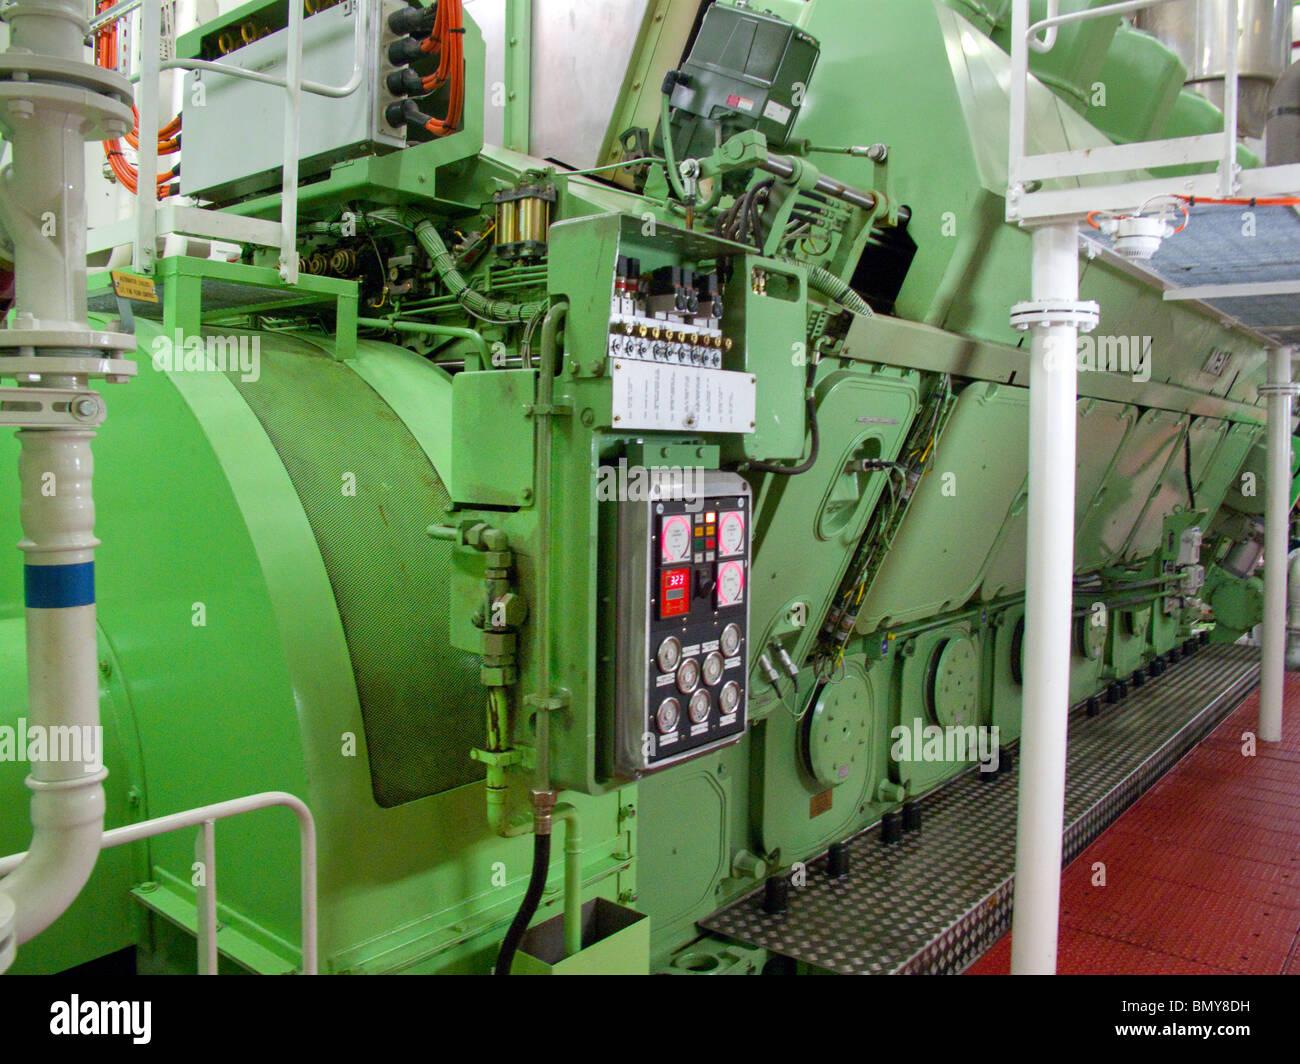 Eurodam Cruise Ship Engine Room Stock Photo 30102845 Alamy